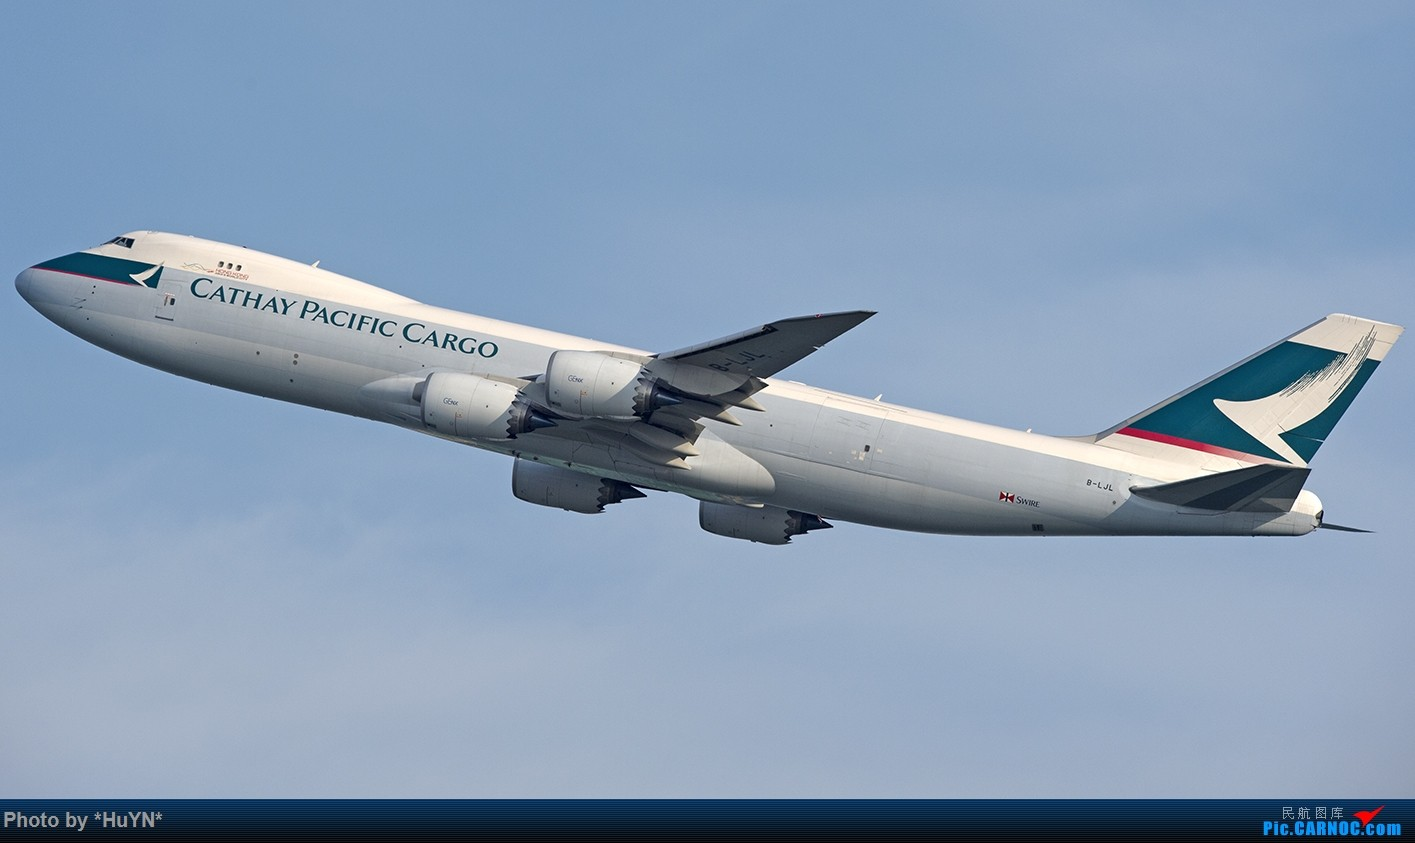 Re:[原创]听说又能审图了我也试试之二 BOEING 747-8F B-LJL 中国香港赤鱲角国际机场